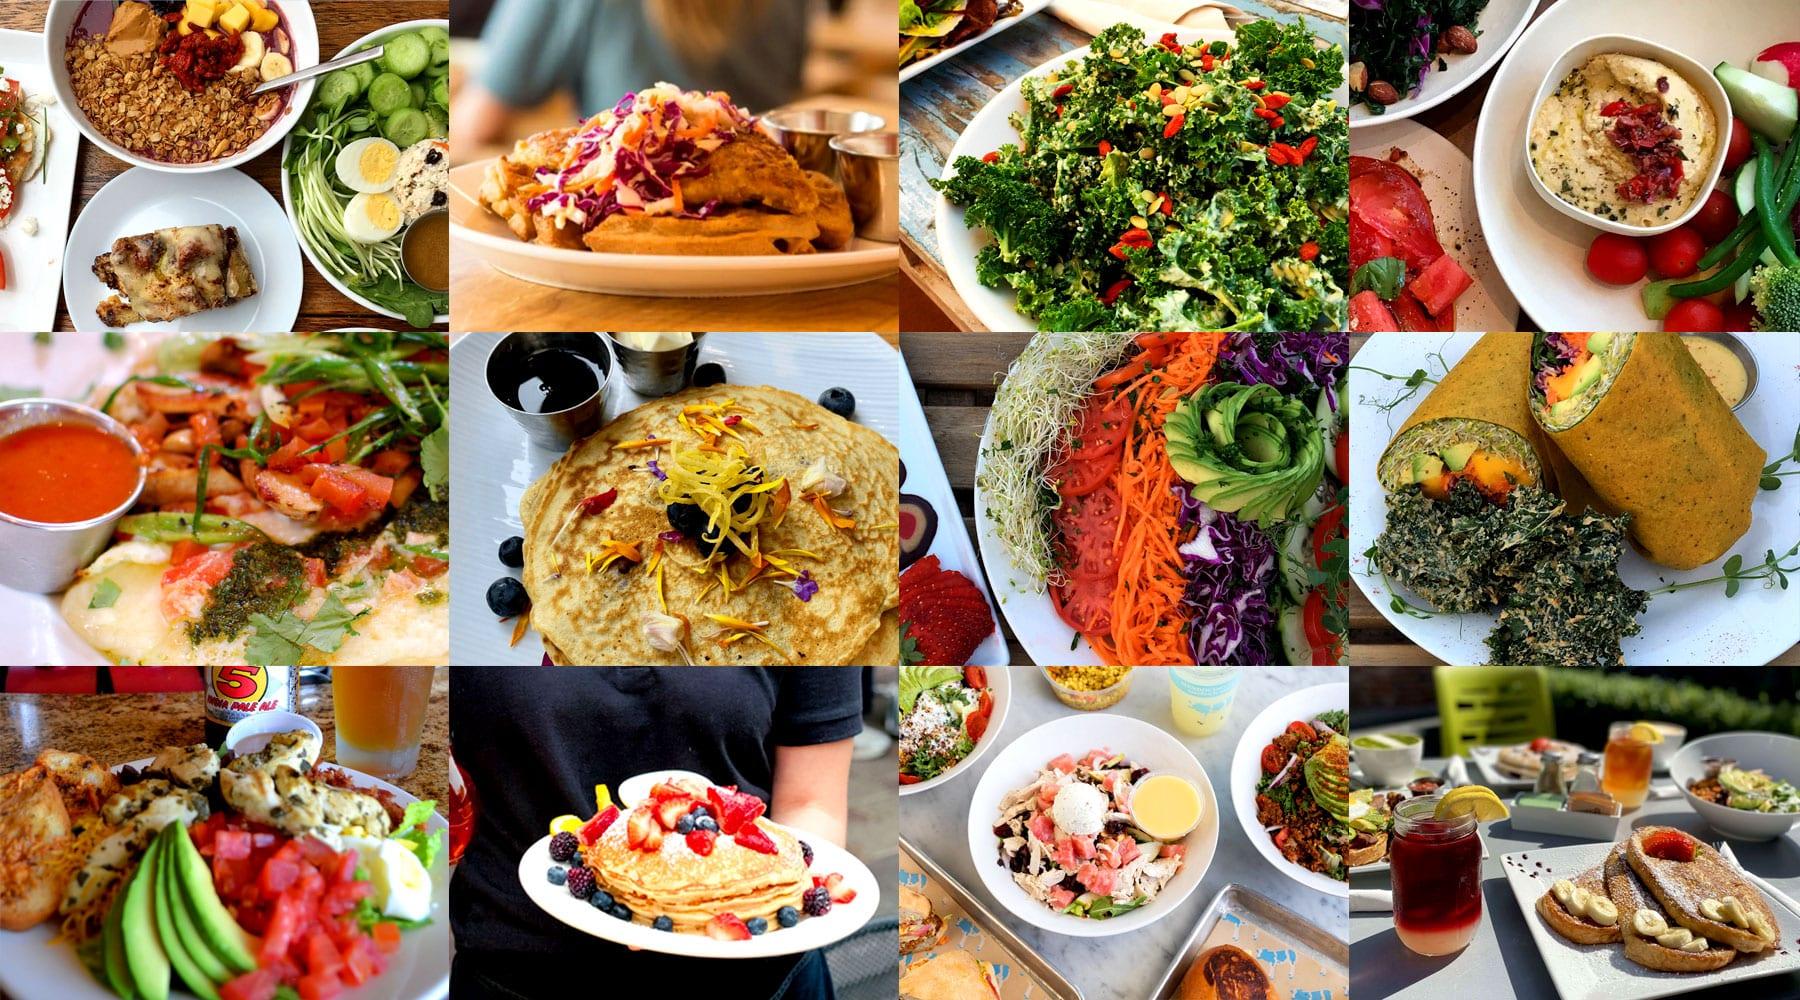 The Best Healthy Restaurants In San Diego, By Neighborhood